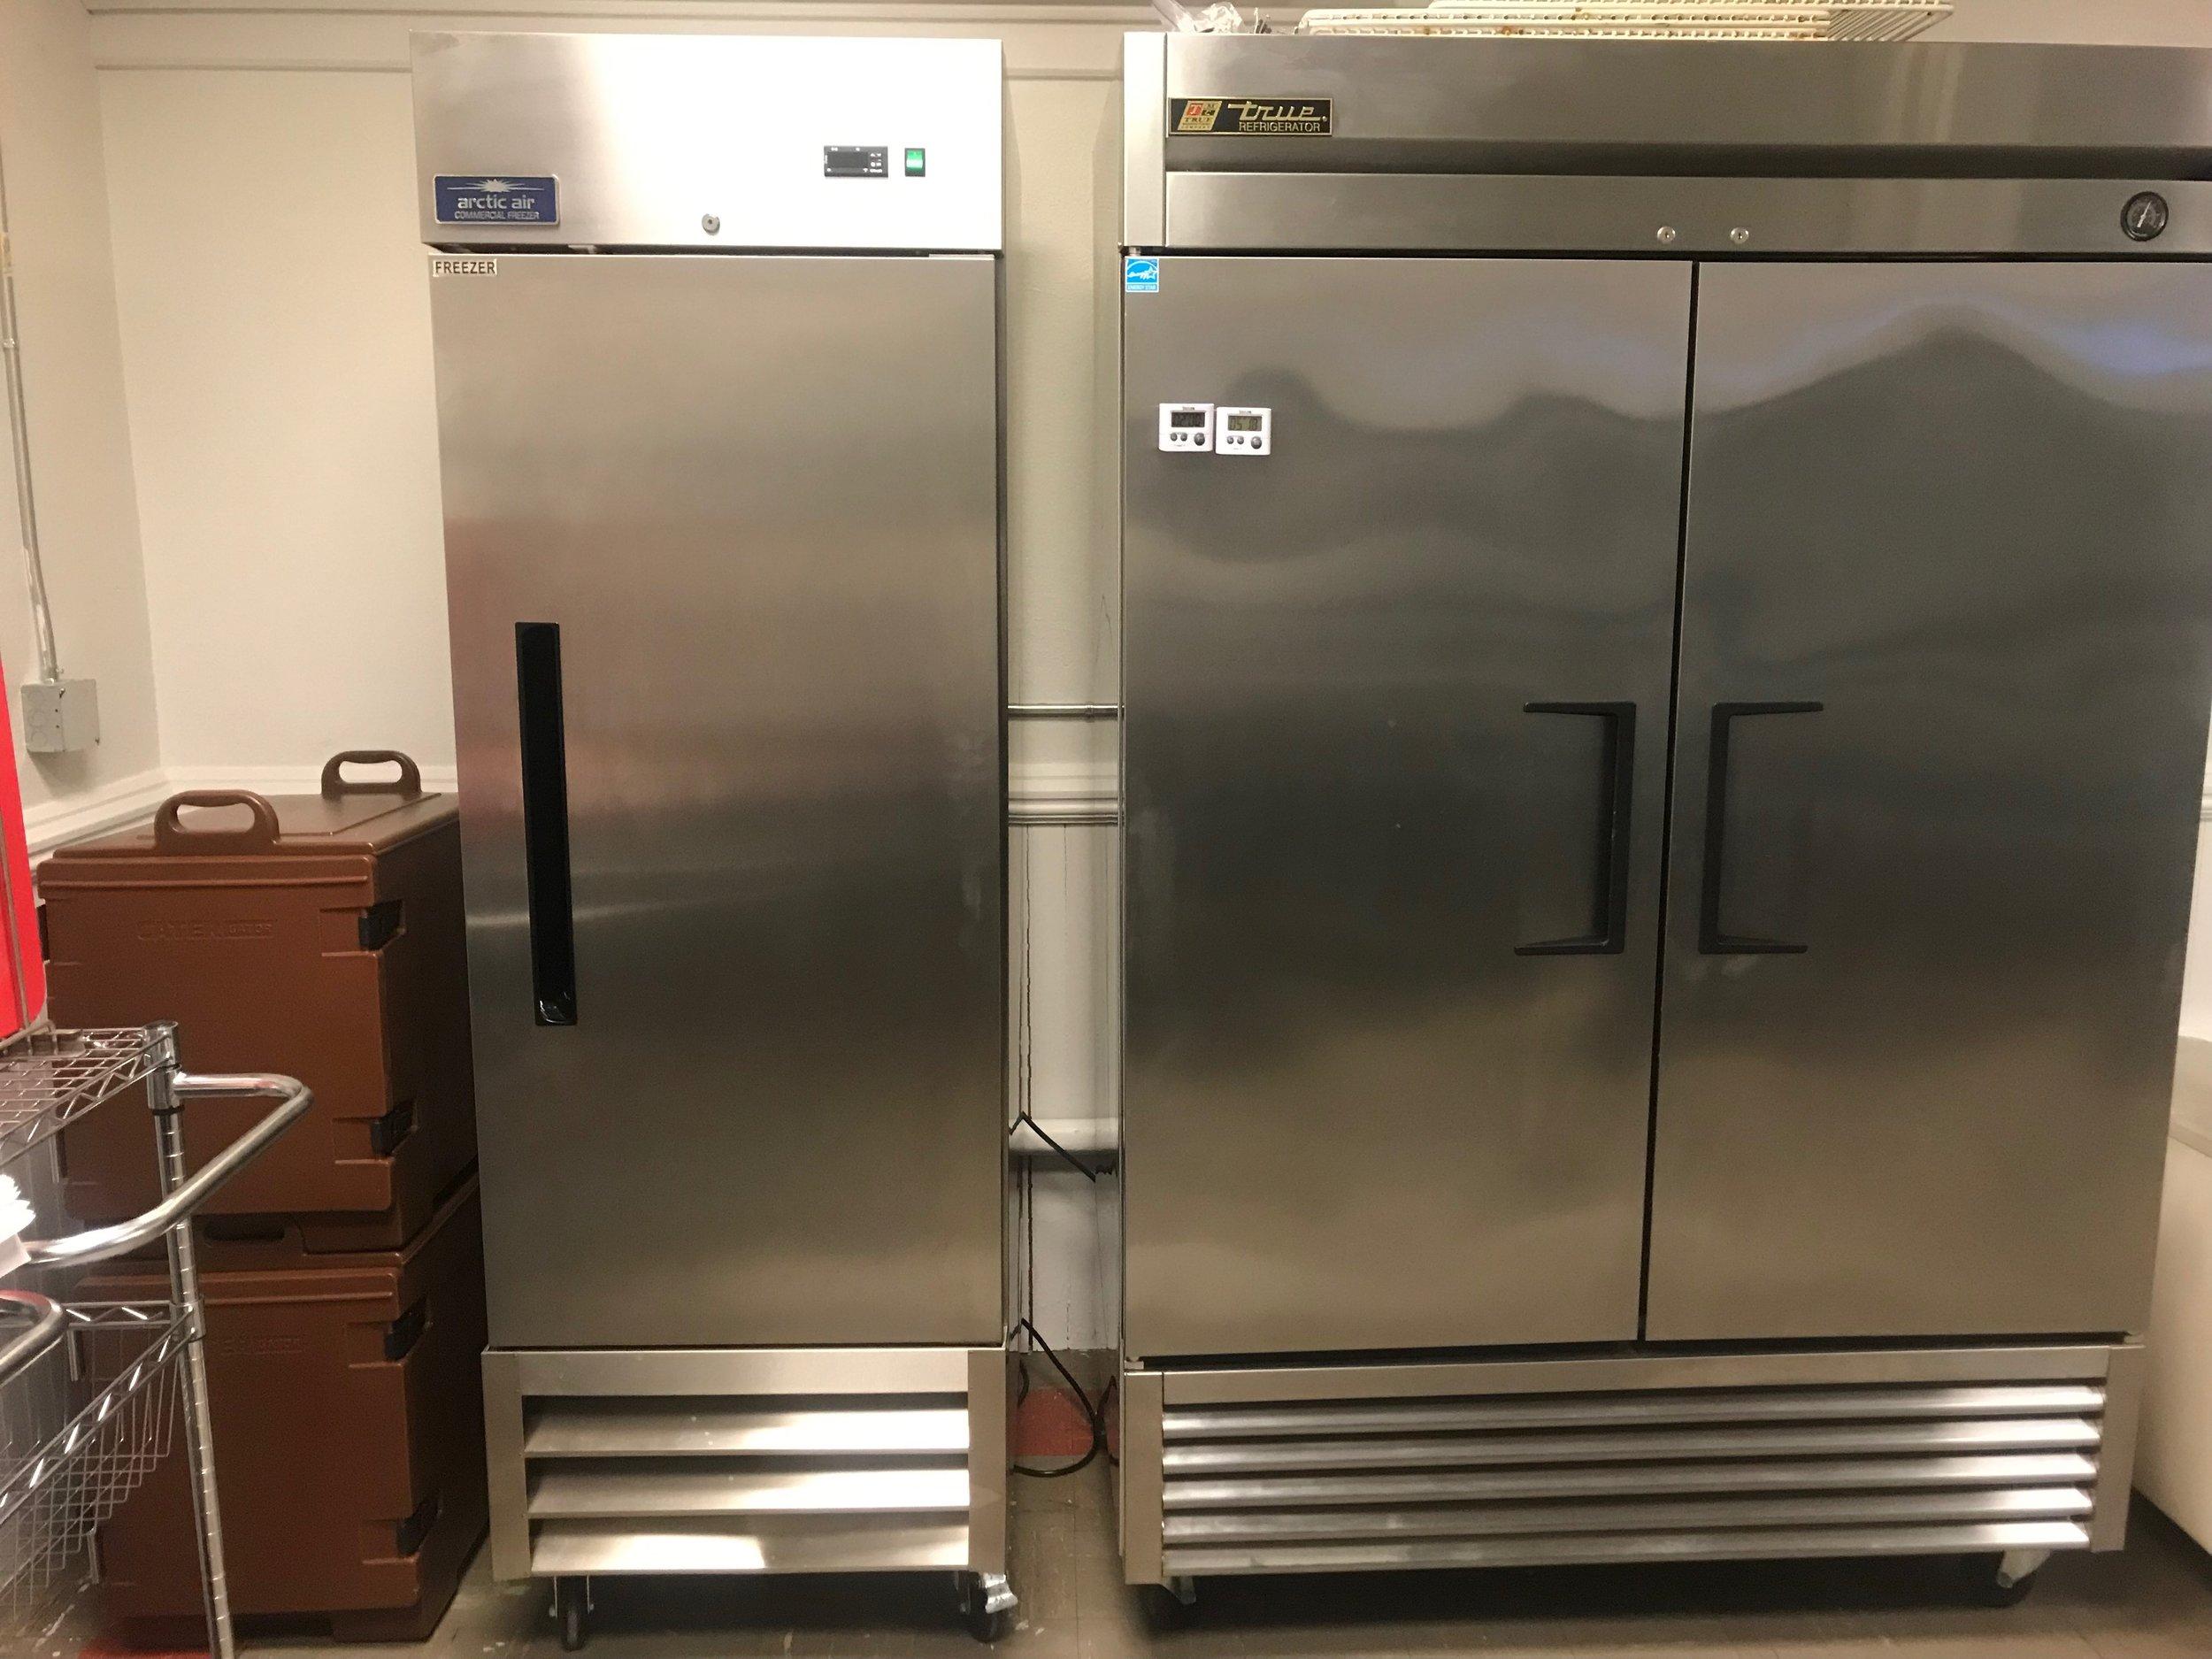 Regrigeration & freezer -